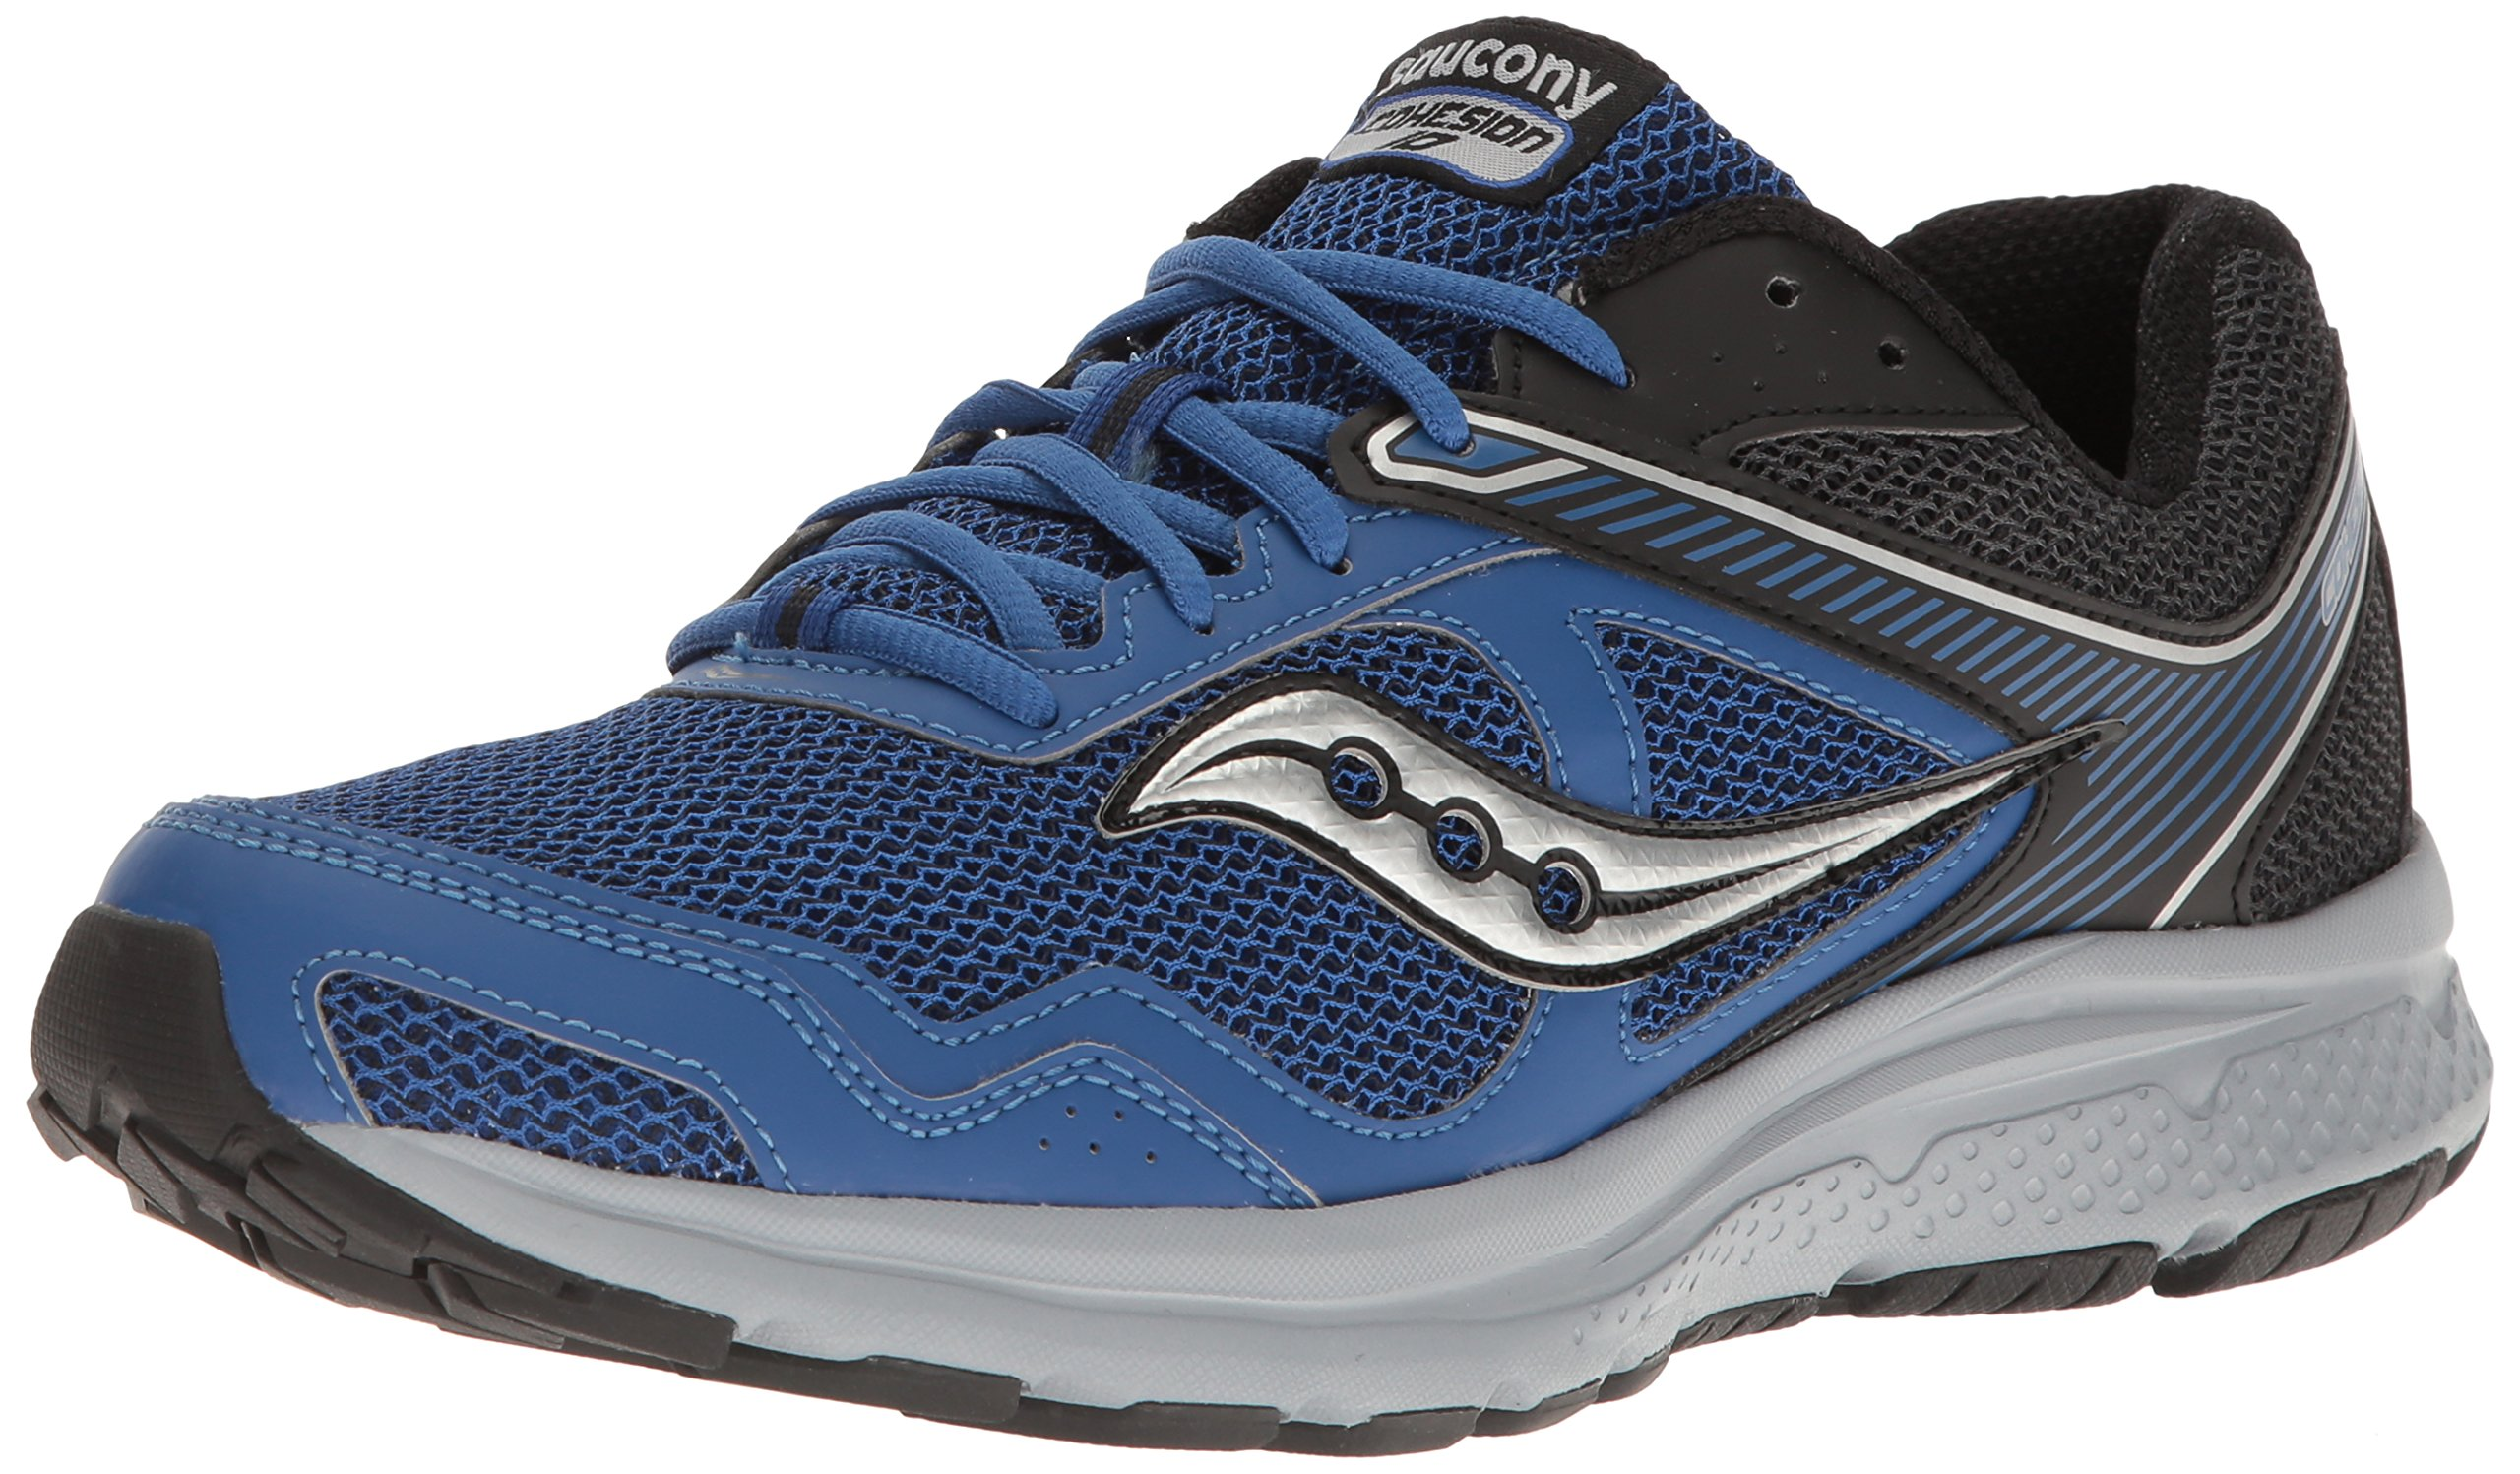 Saucony Men's Cohesion 10 Running Shoe, Royal/Black, 7 M US